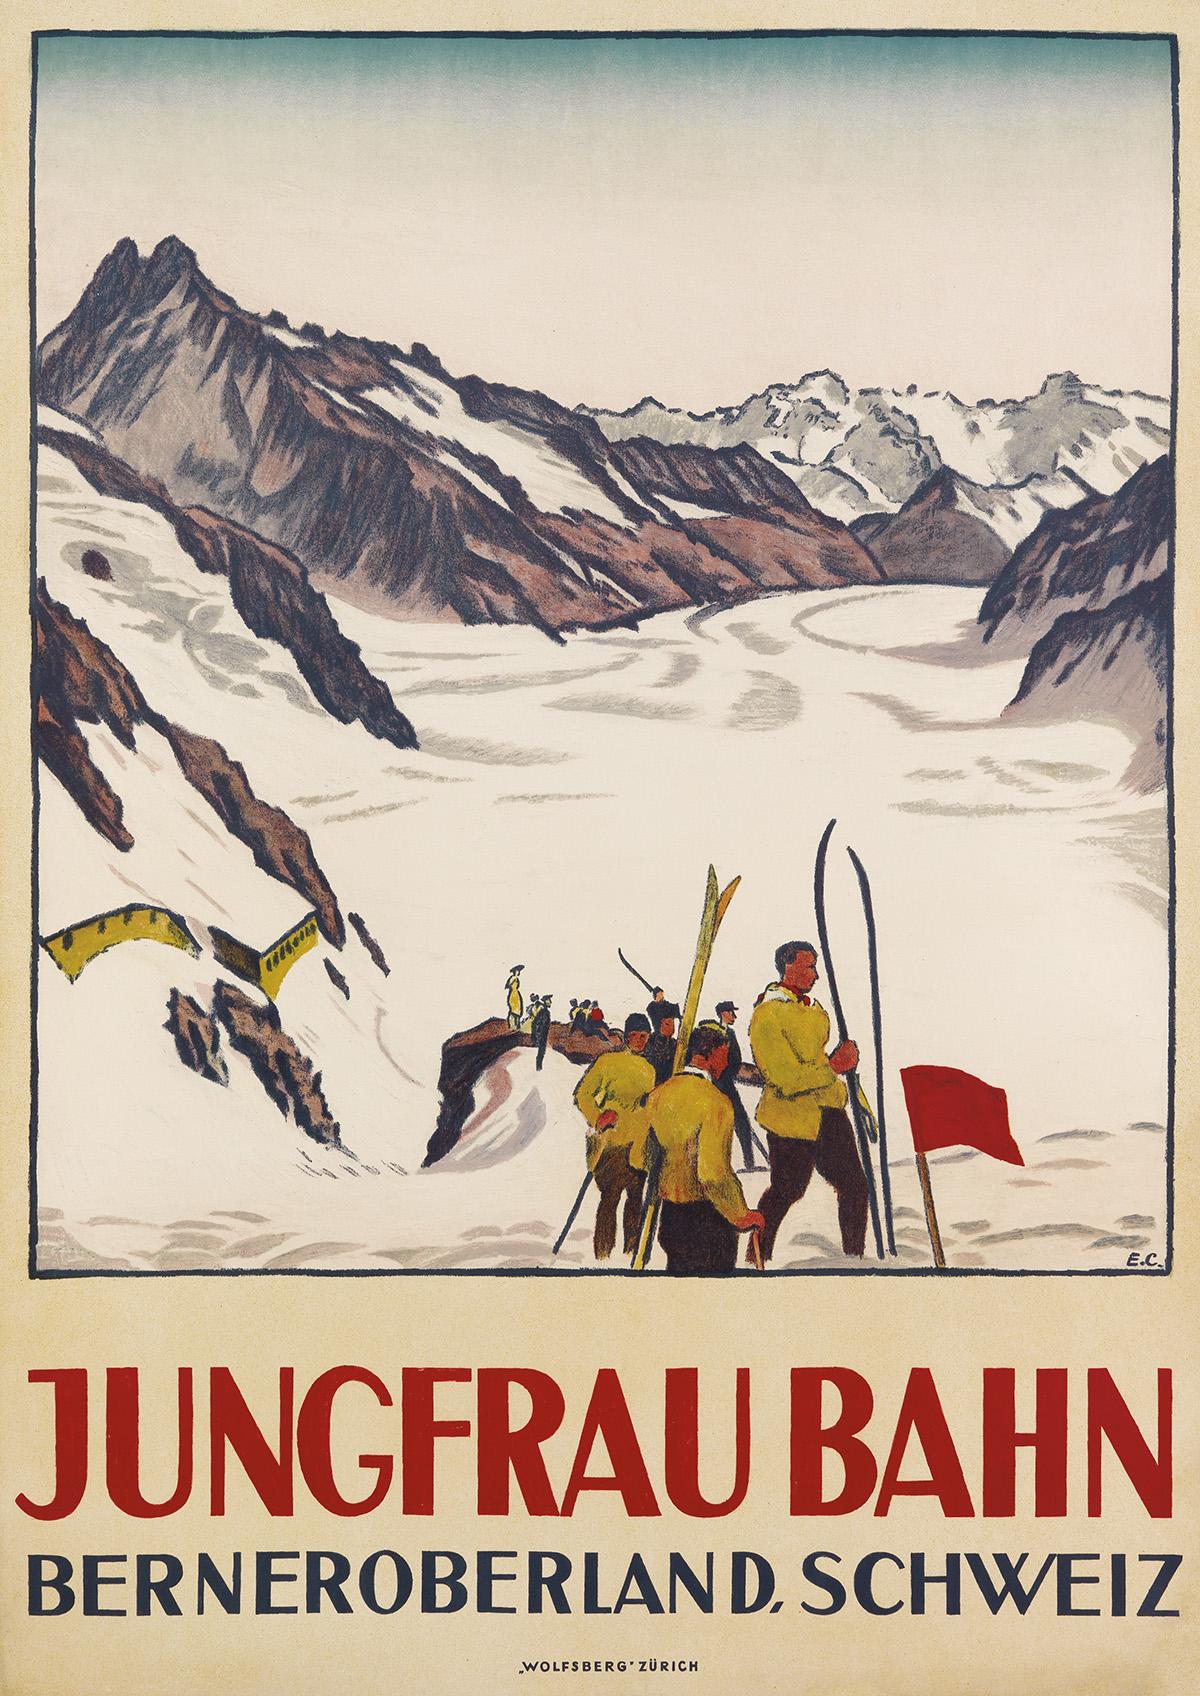 EMIL-CARDINAUX-(1877-1936)-JUNGFRAU-BAHN--BERNEROBERLAND-SCH